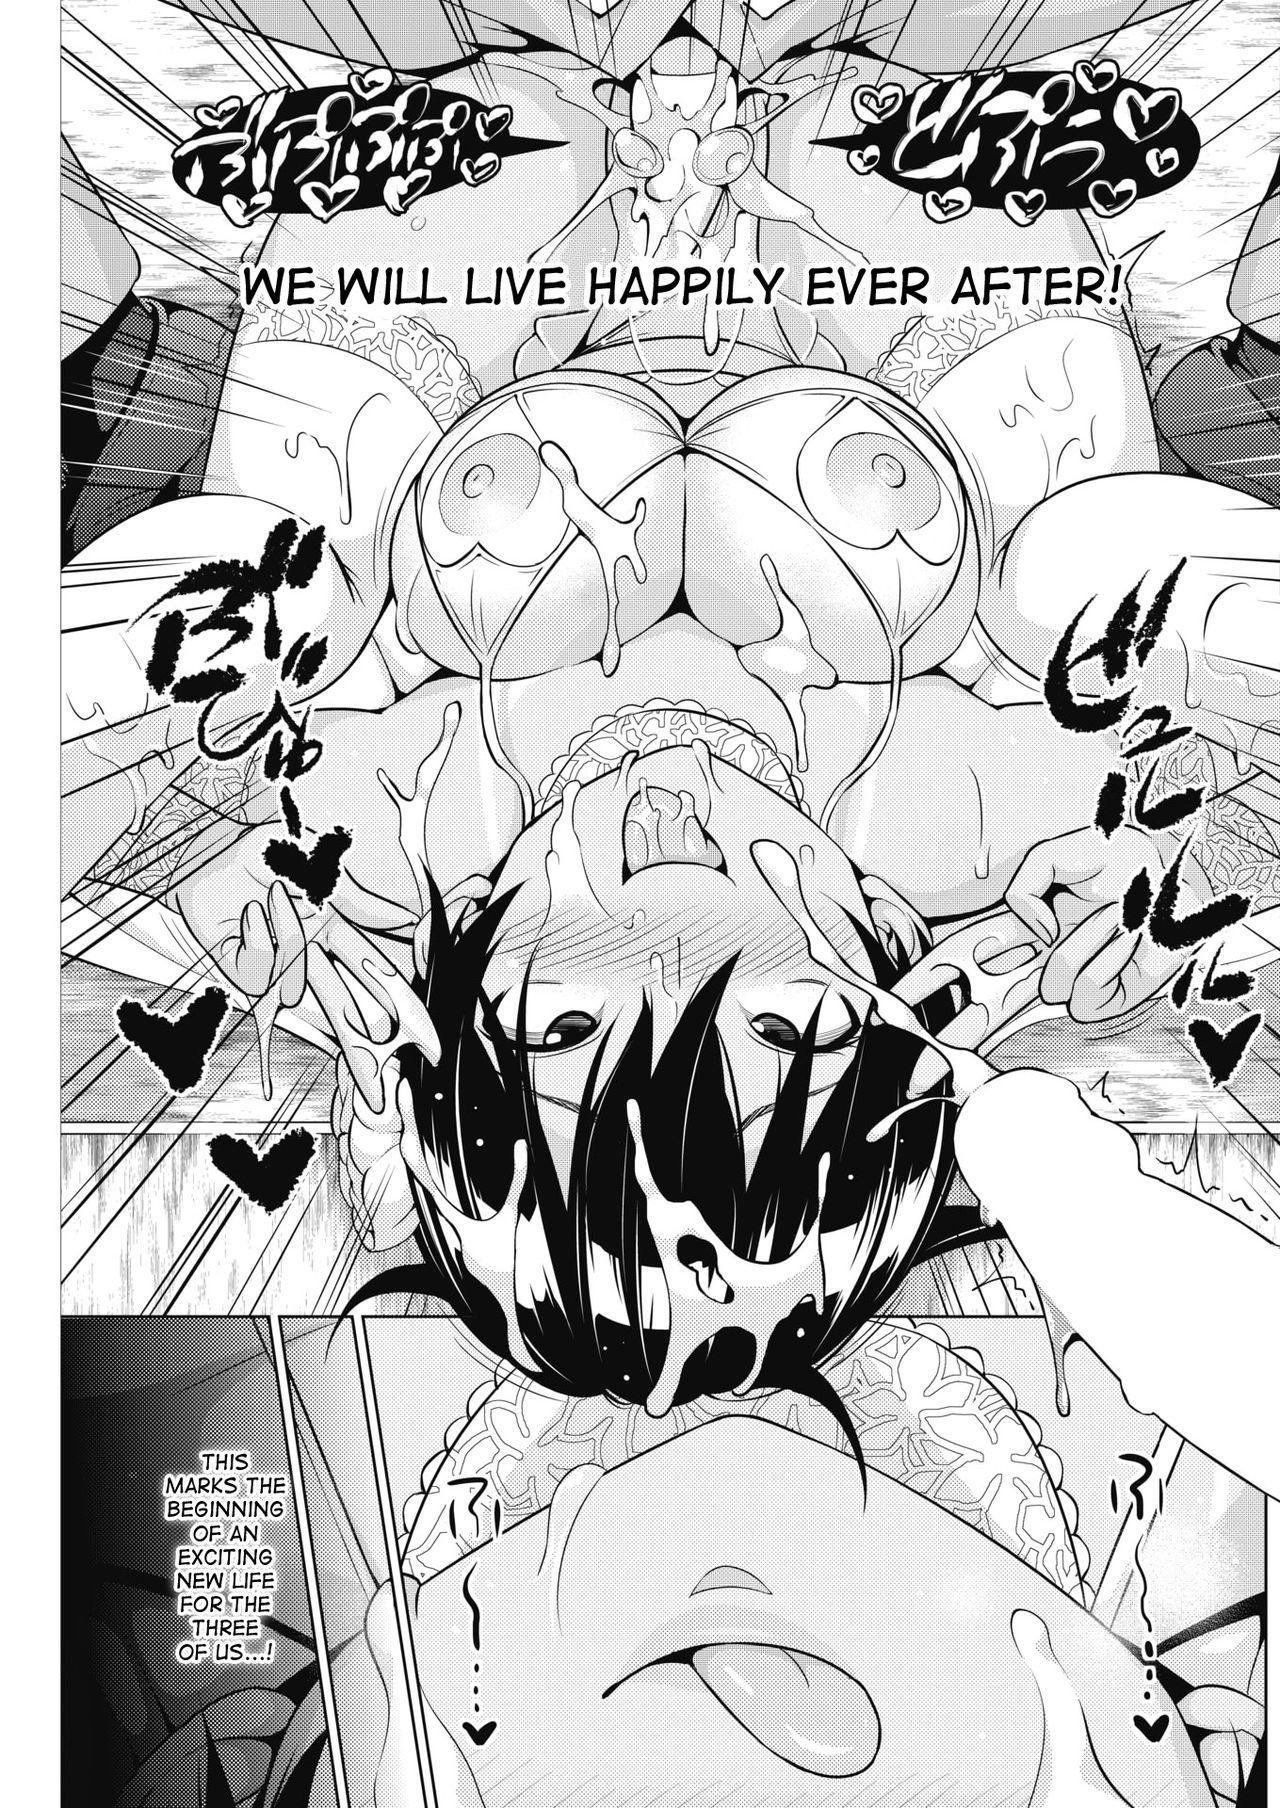 Tsukaretemo Koi ga Shitai! | Even If I'm Haunted by a Ghost, I still want to Fall in Love! 54